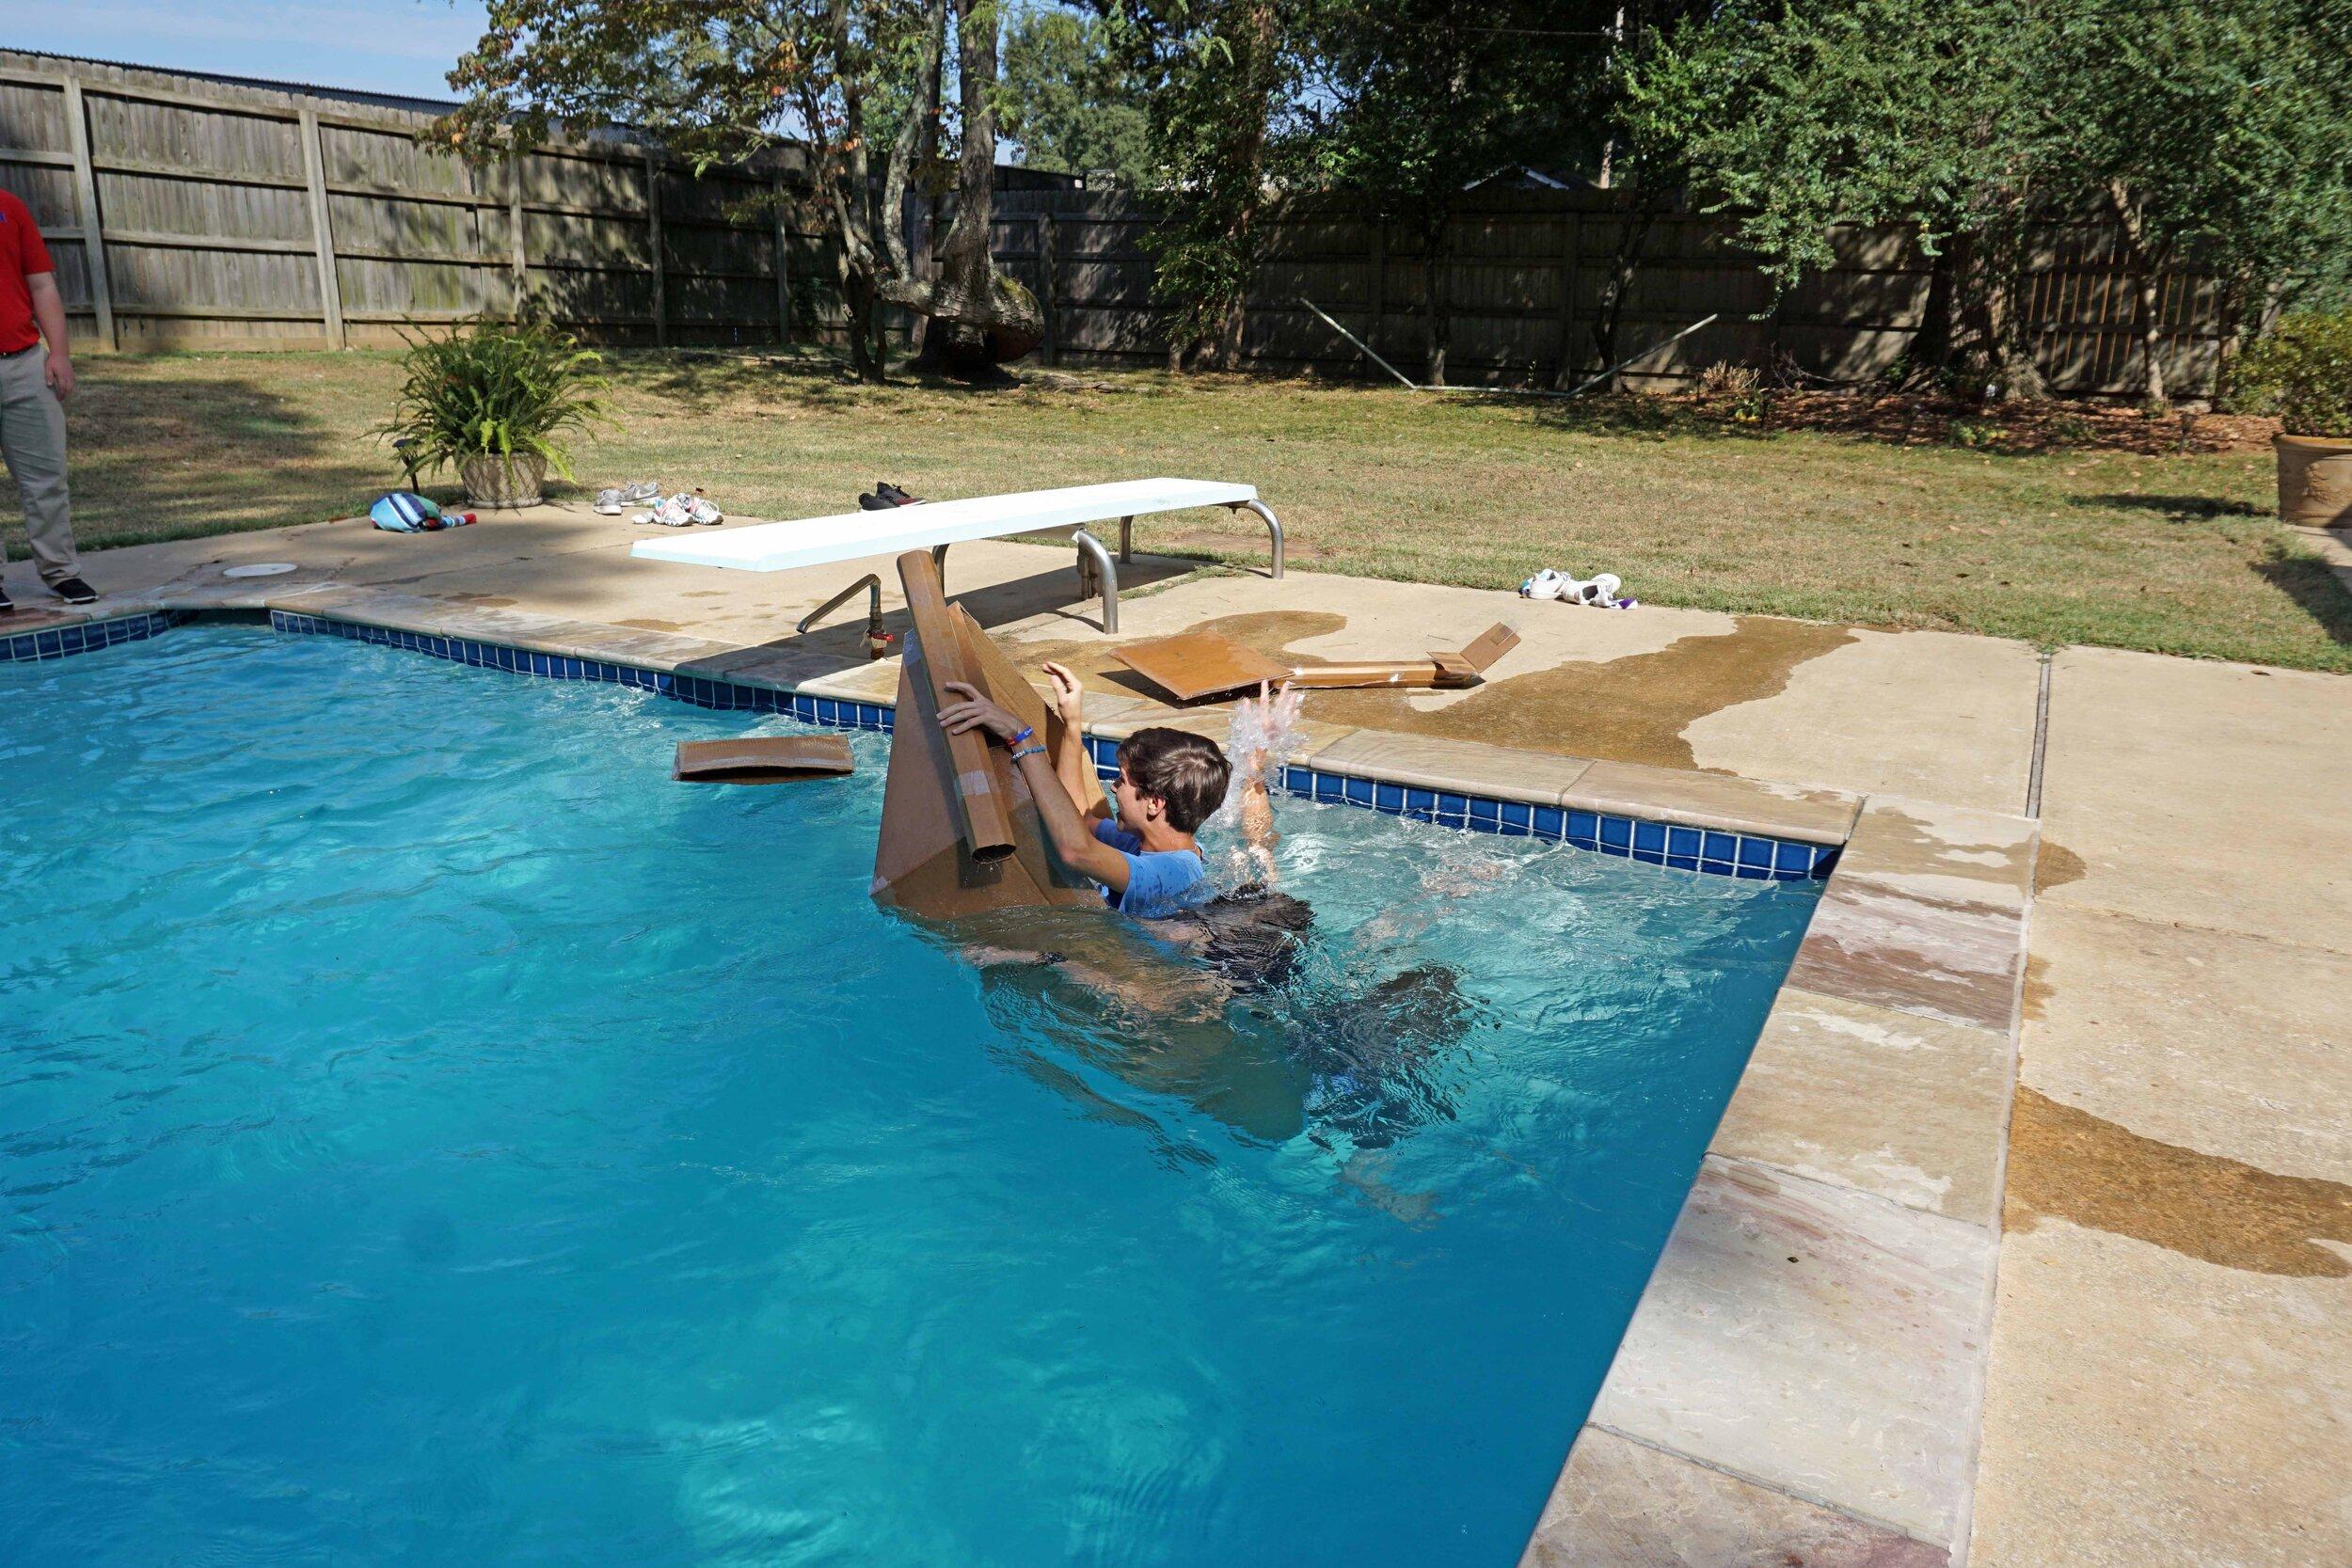 Sept27 DoCardboardBoatsFloat74.jpg